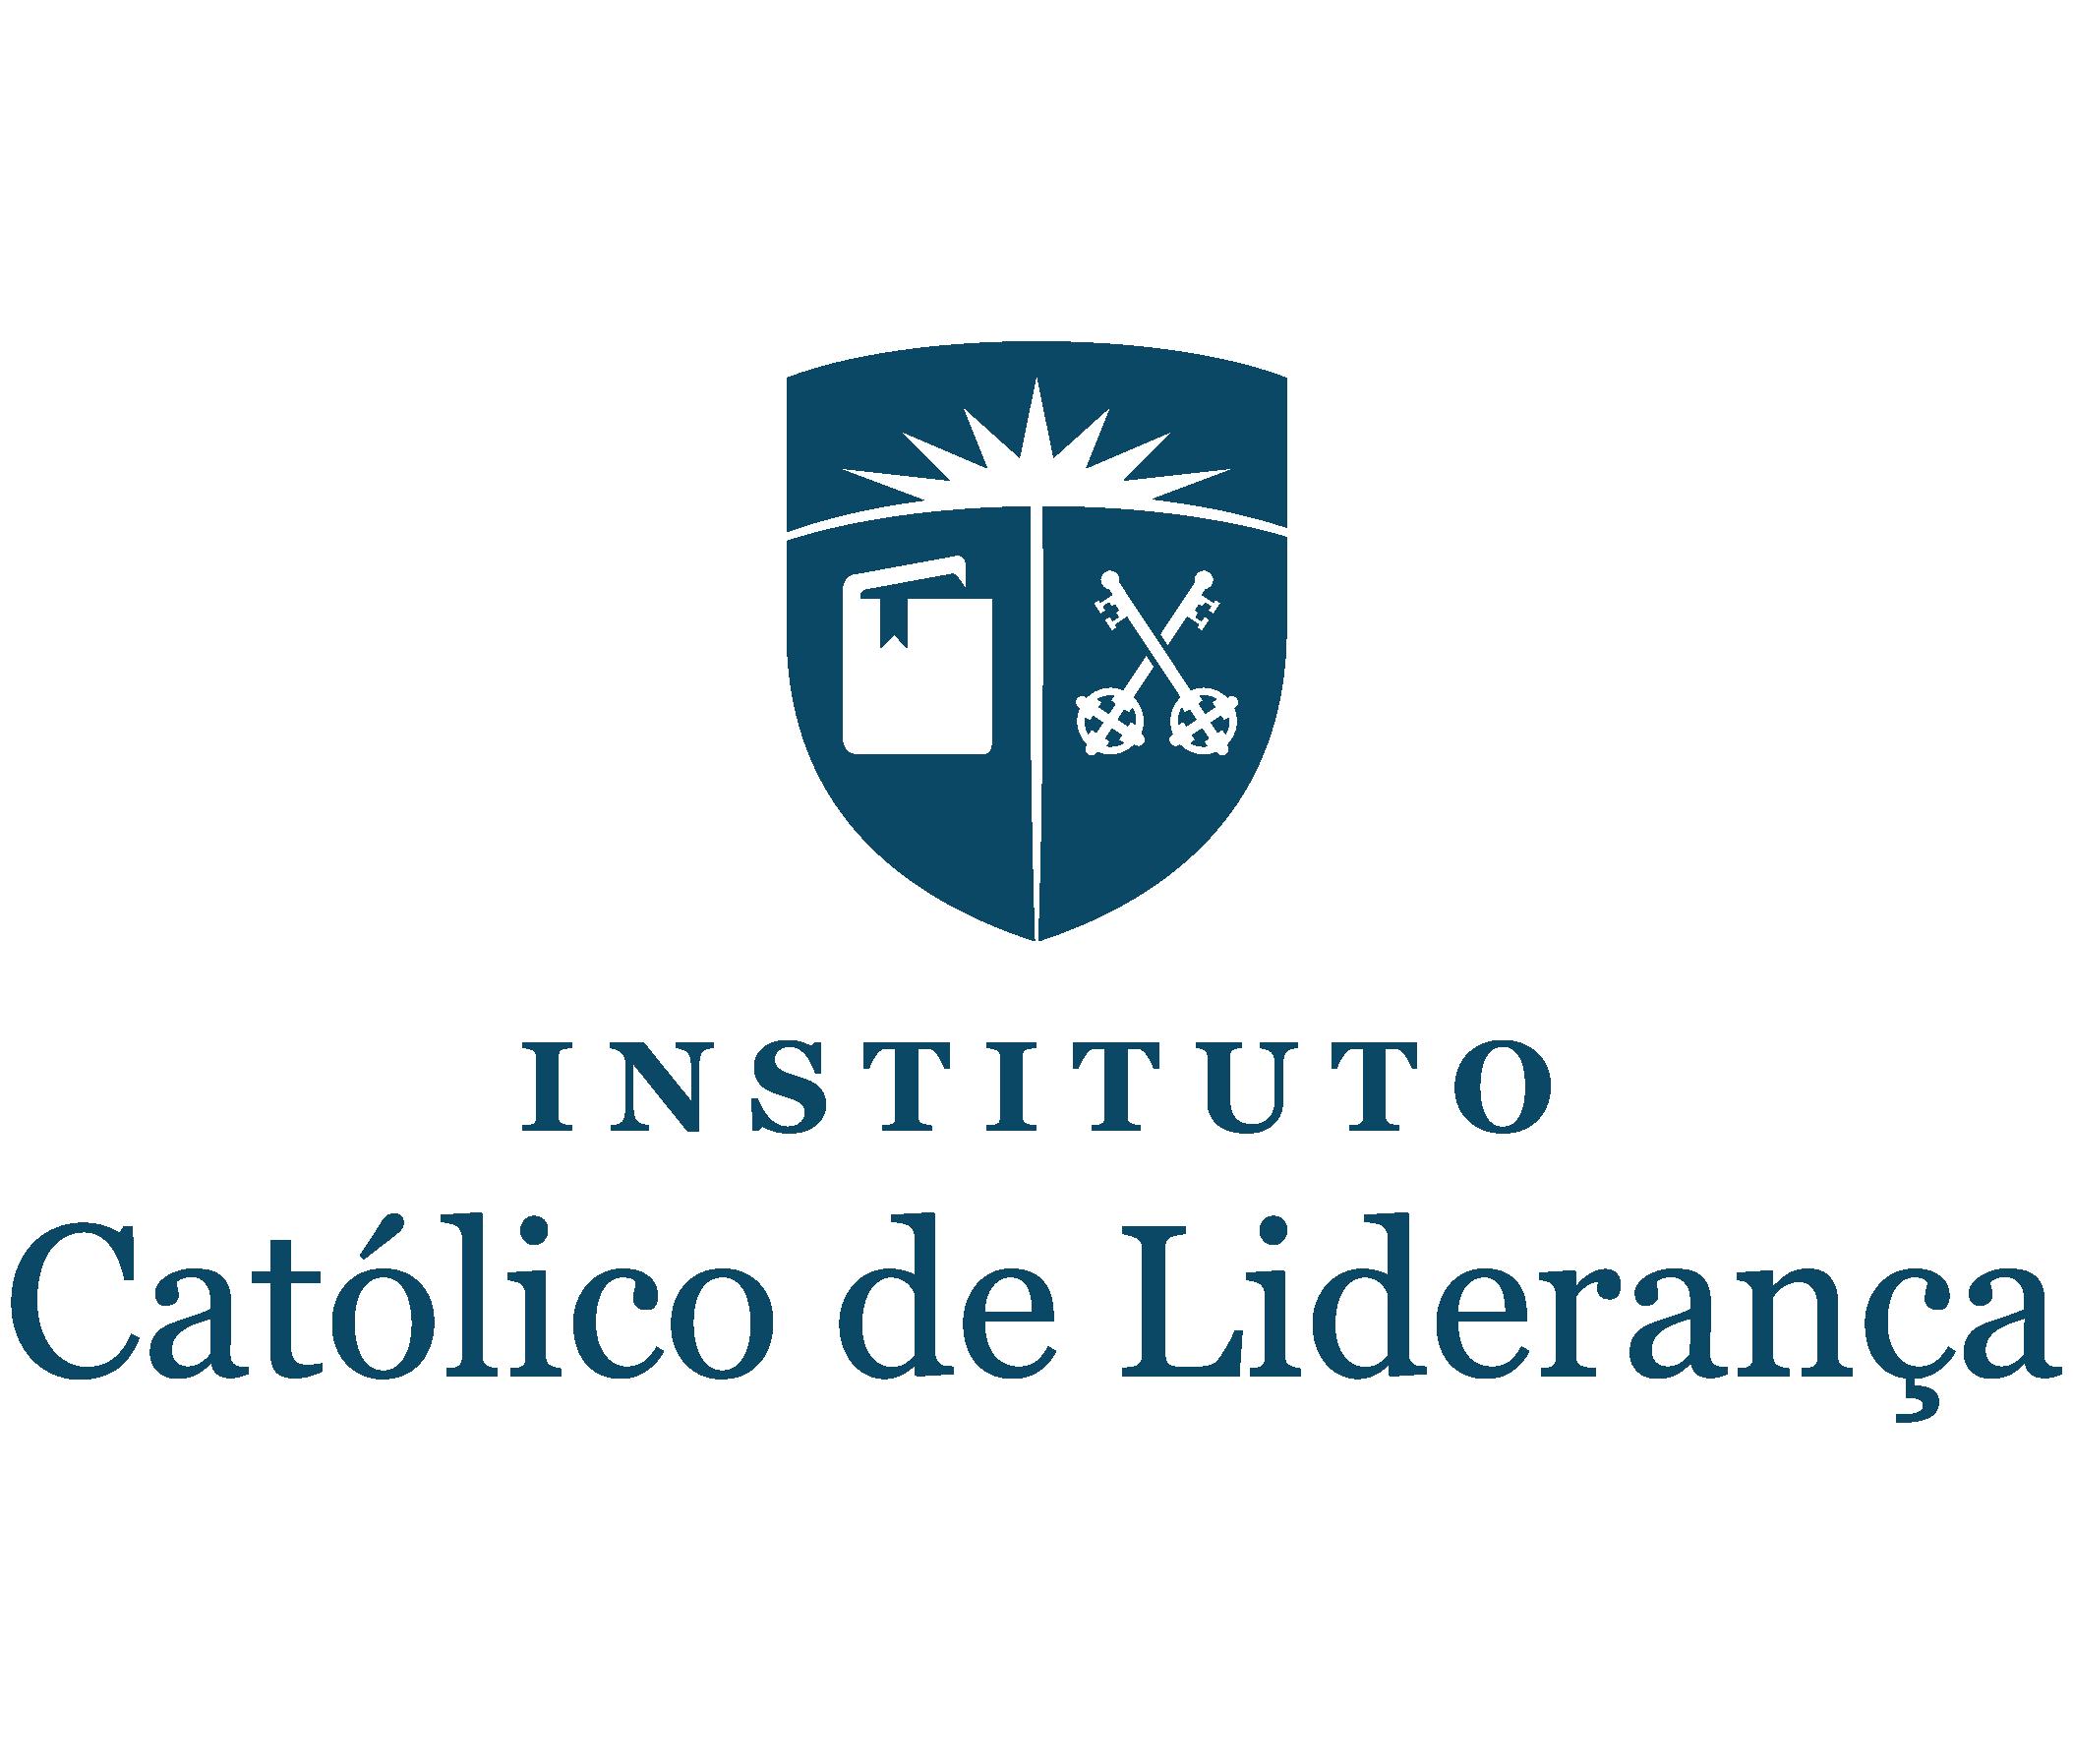 Instituto Católico de Liderança